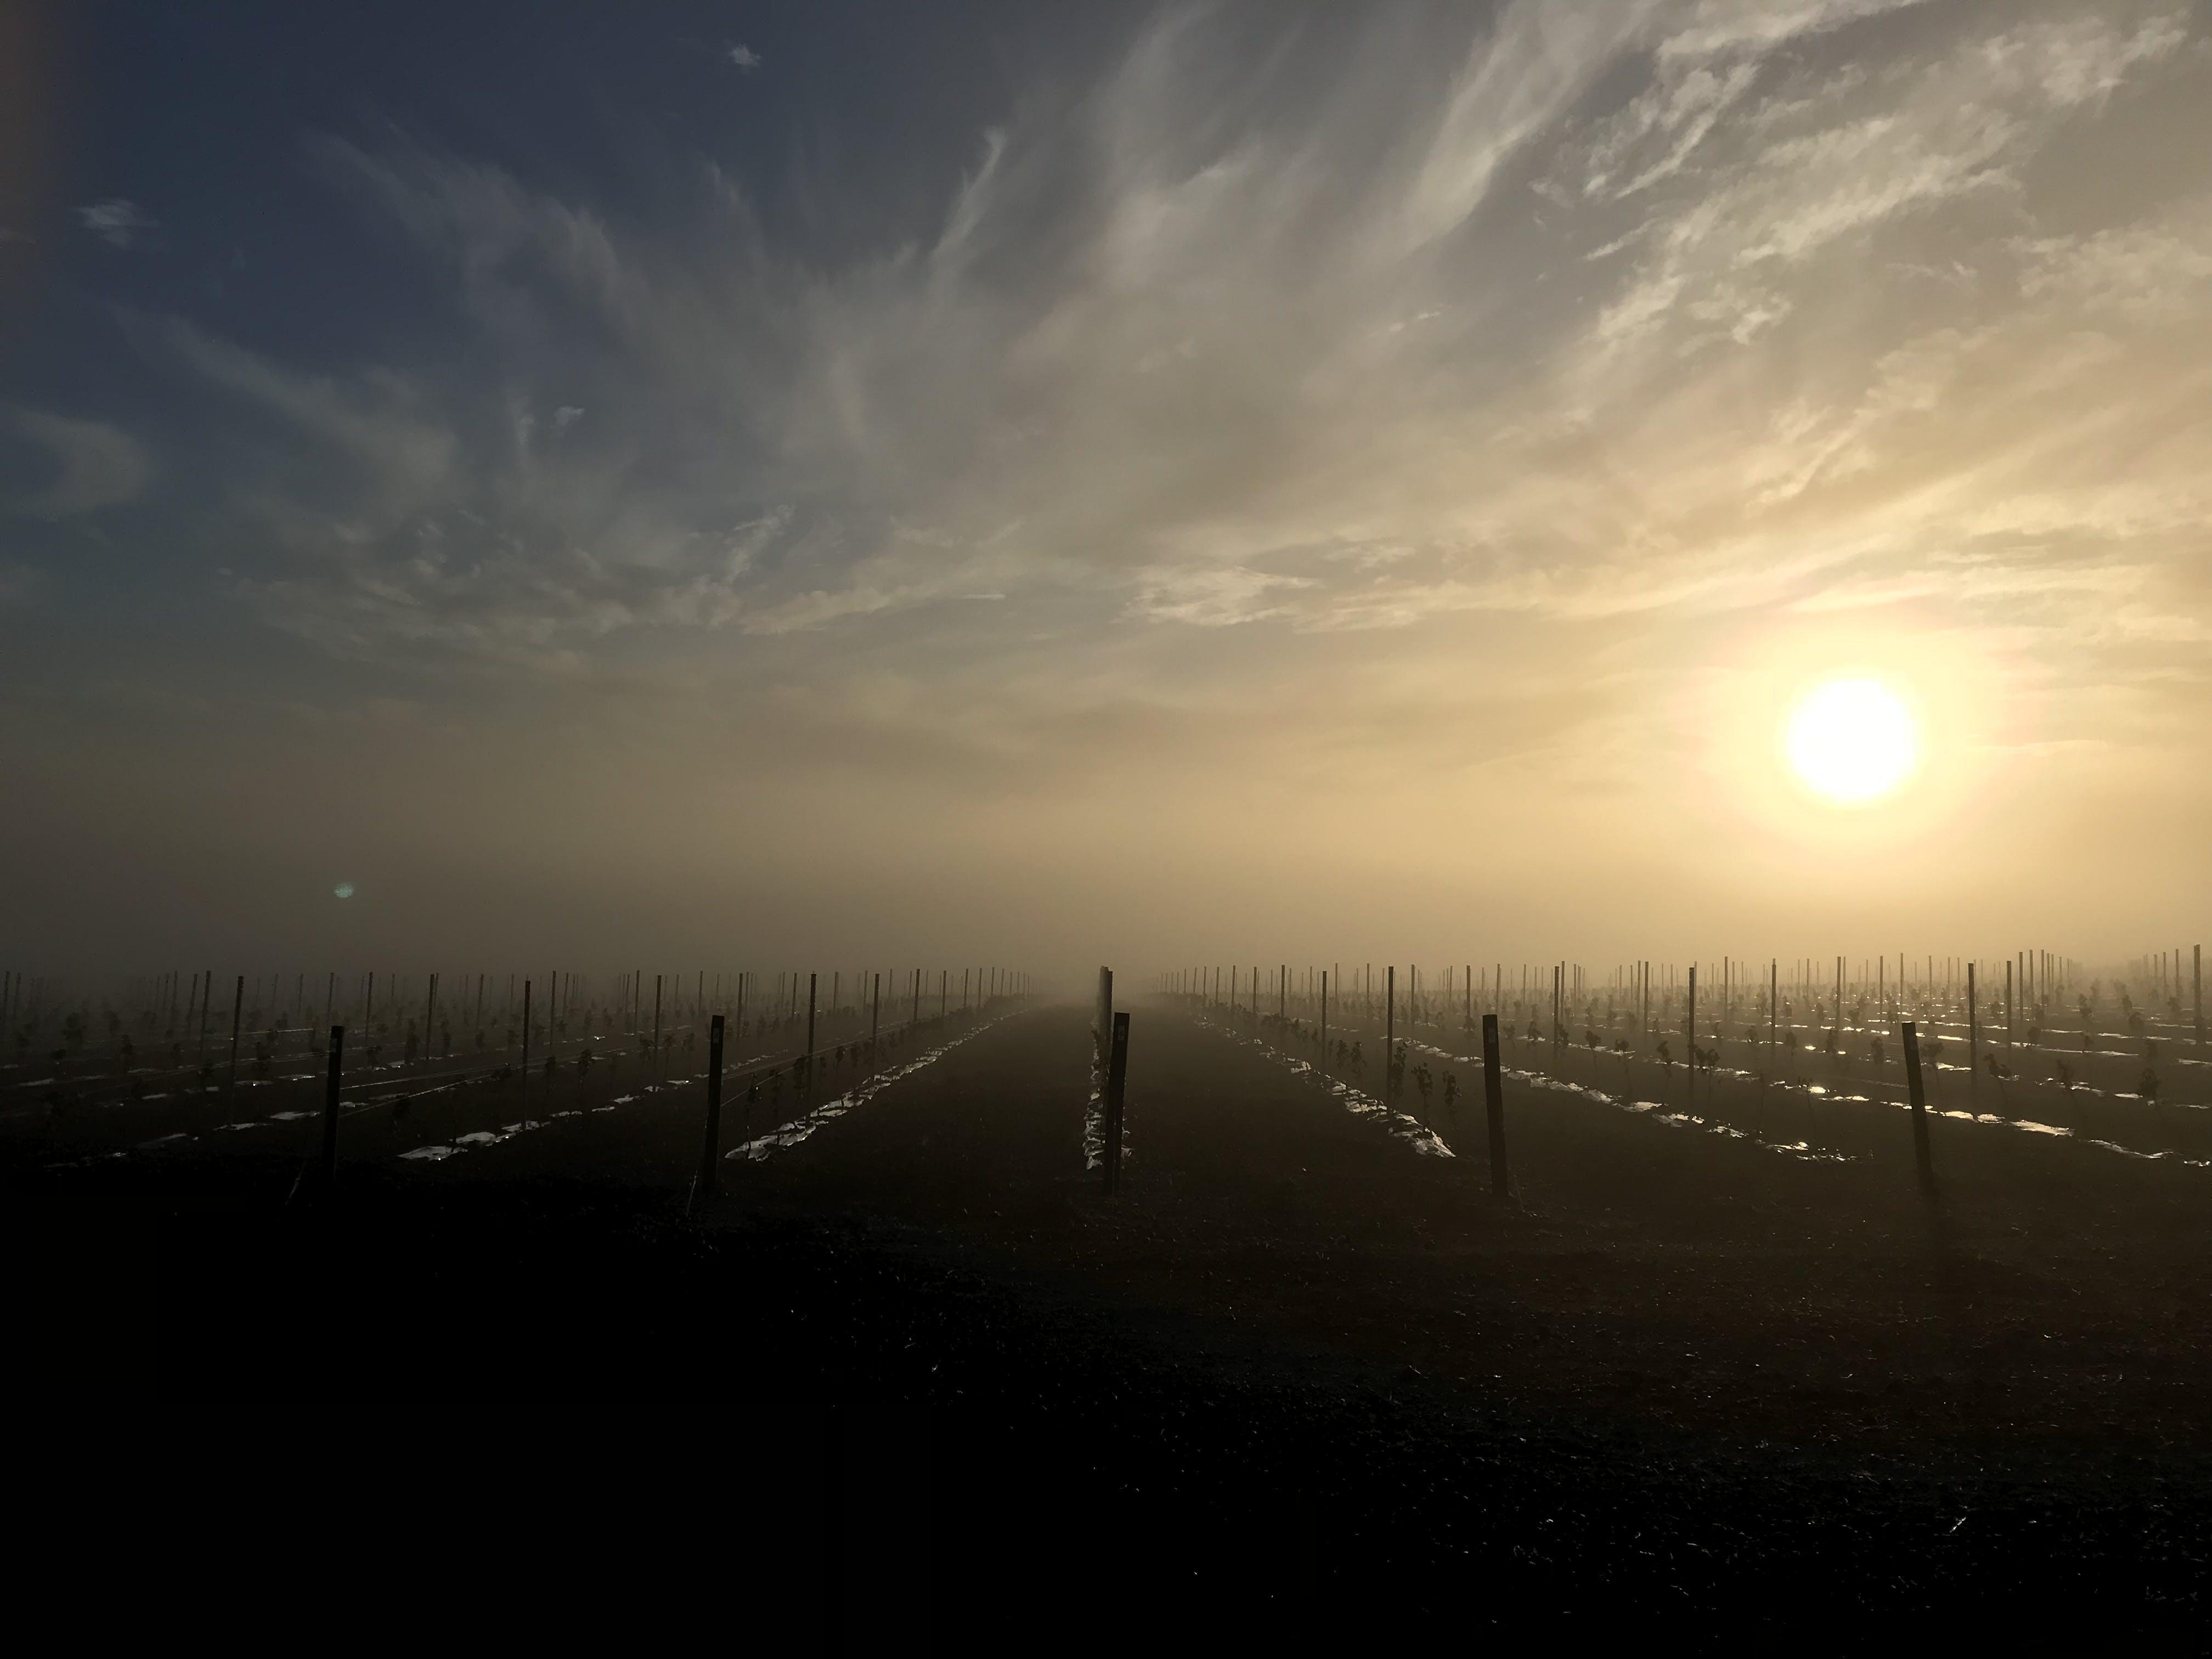 Free stock photo of foggy, grape, grapevines, mist